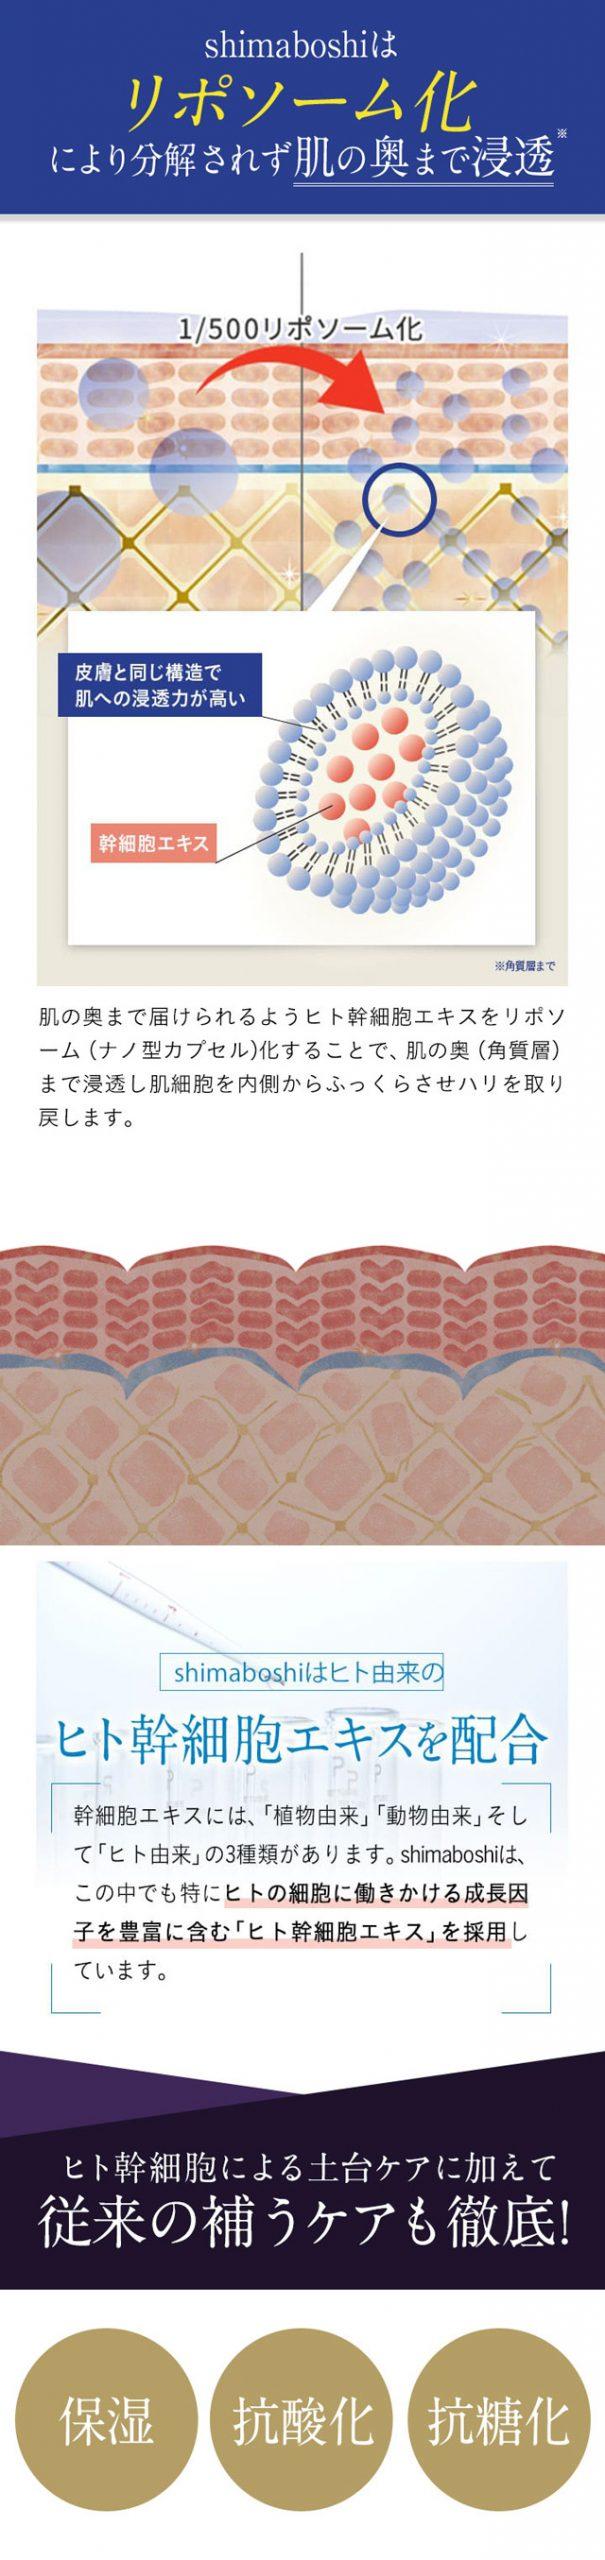 shimaboshi(シマボシ) レストレーションセラム,特徴,効果